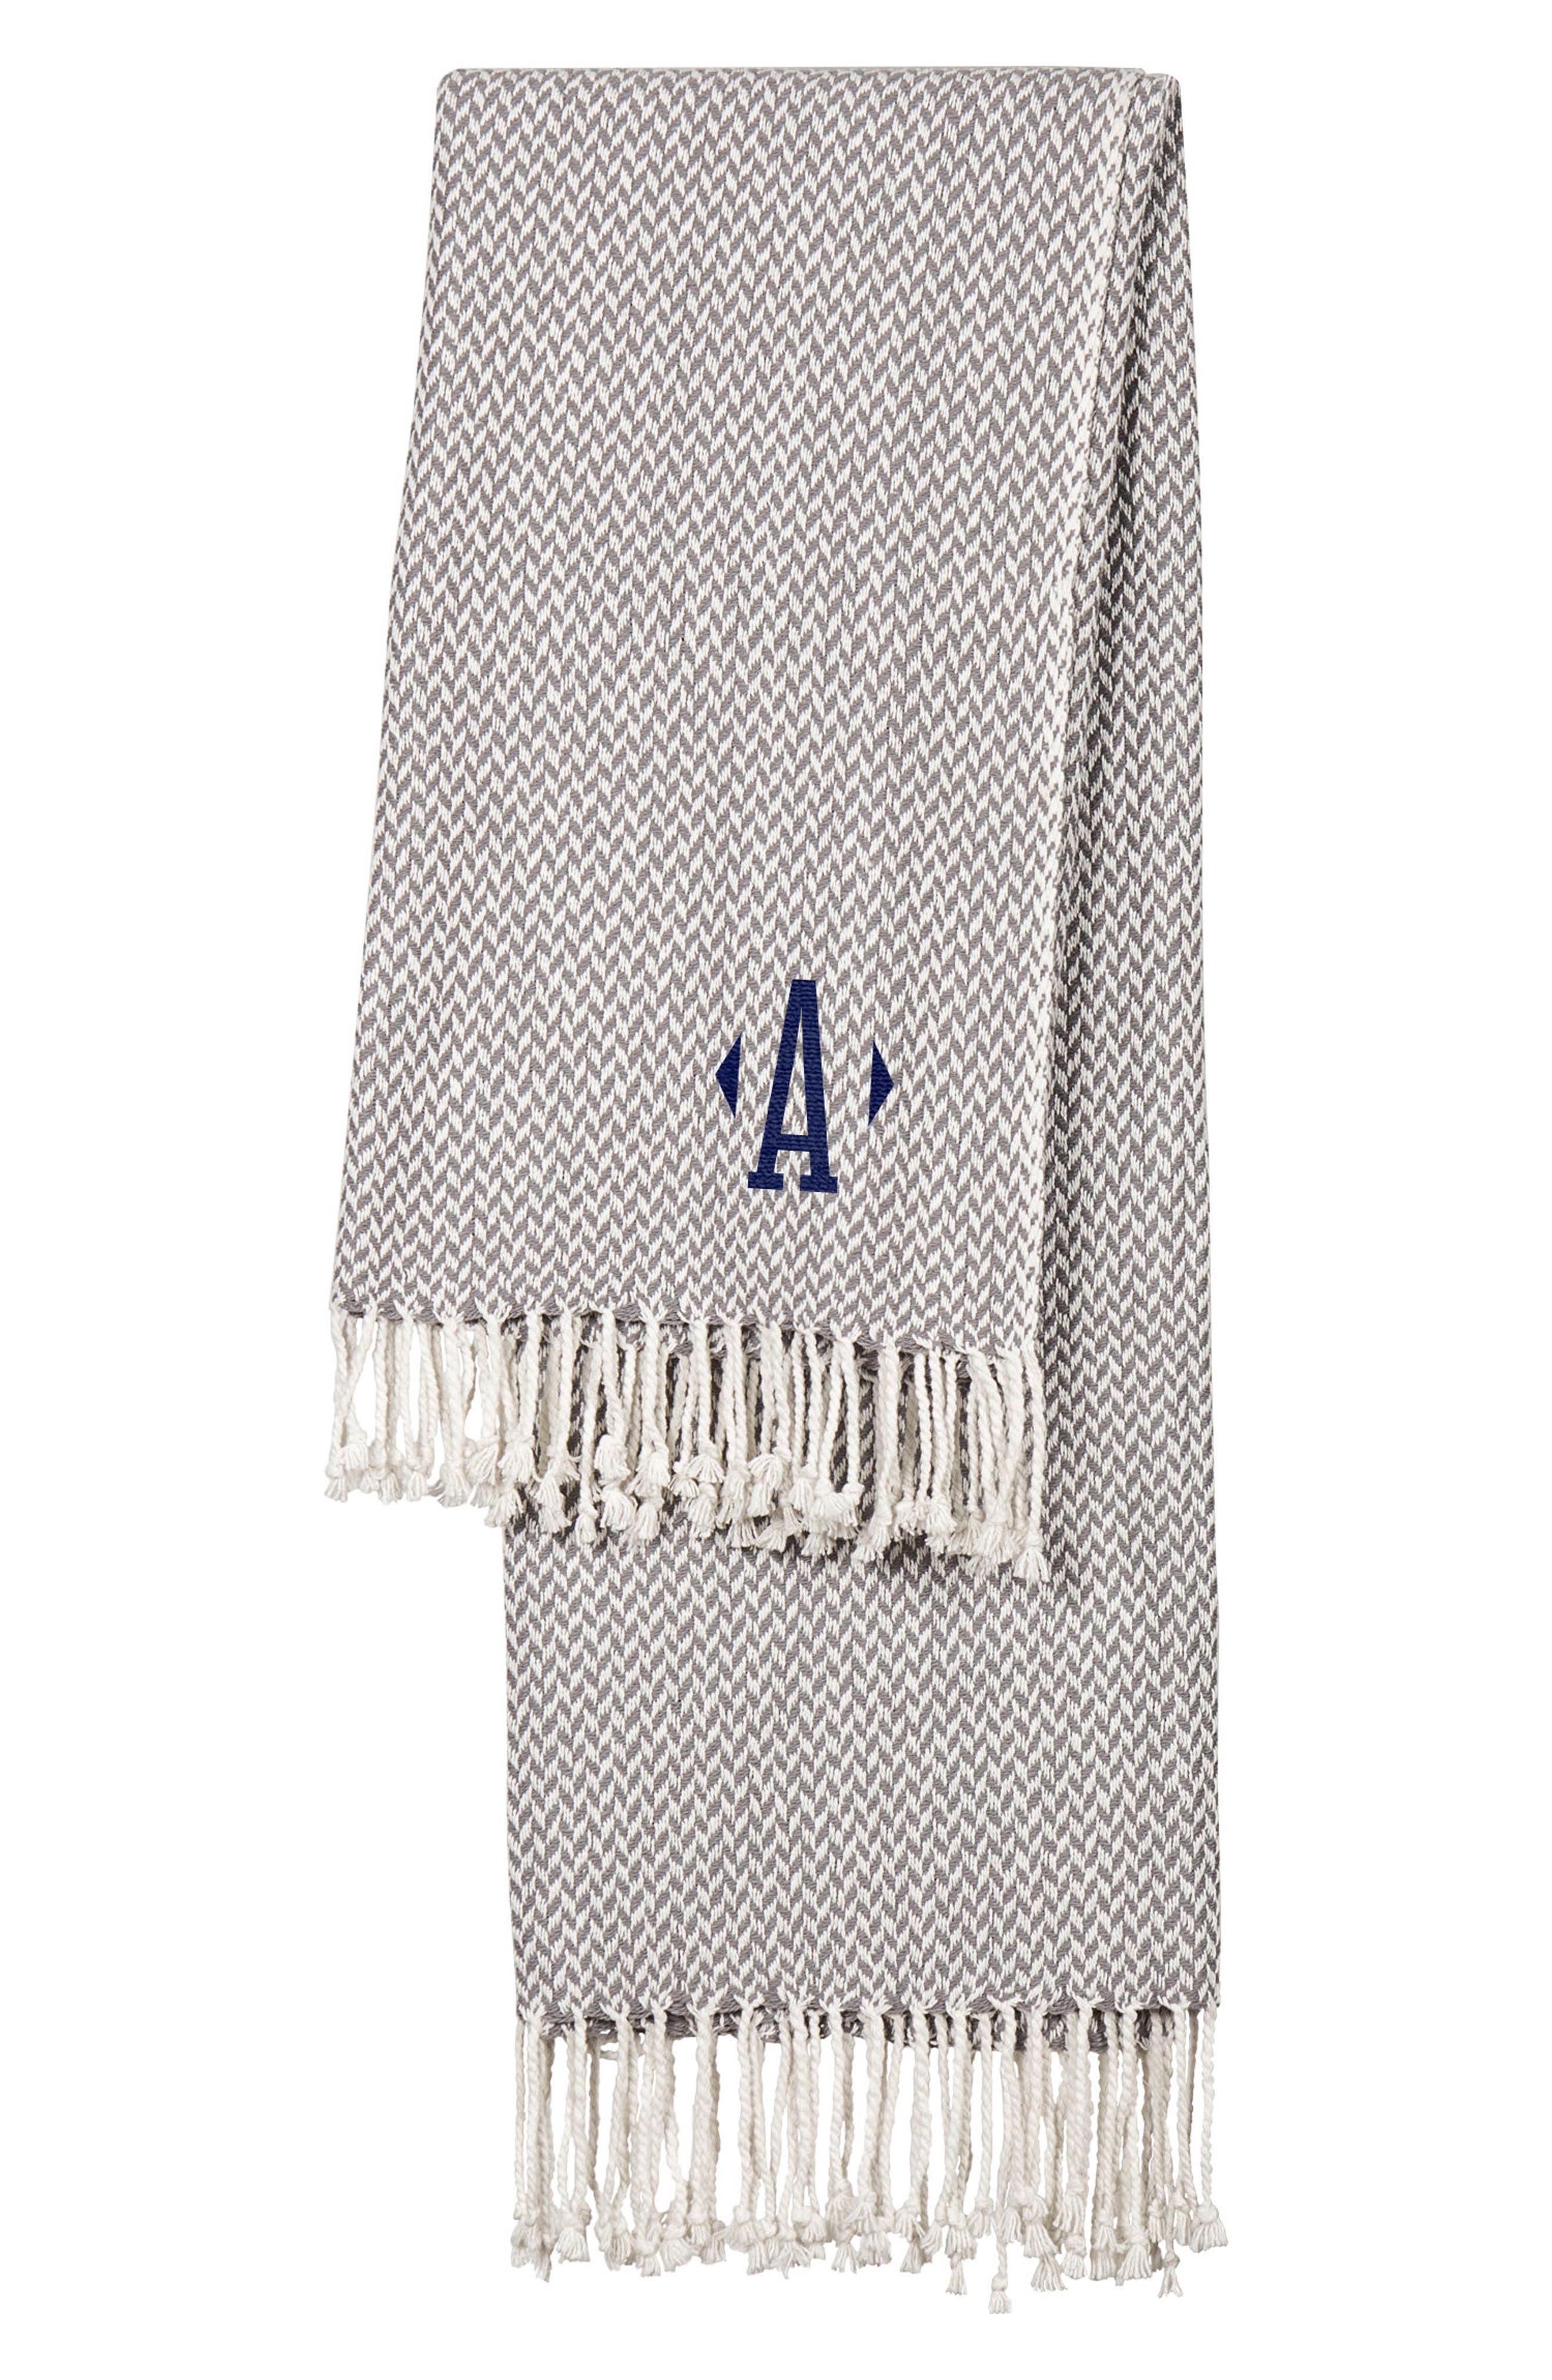 Monogram Herringbone Throw Blanket,                         Main,                         color, GREY-A